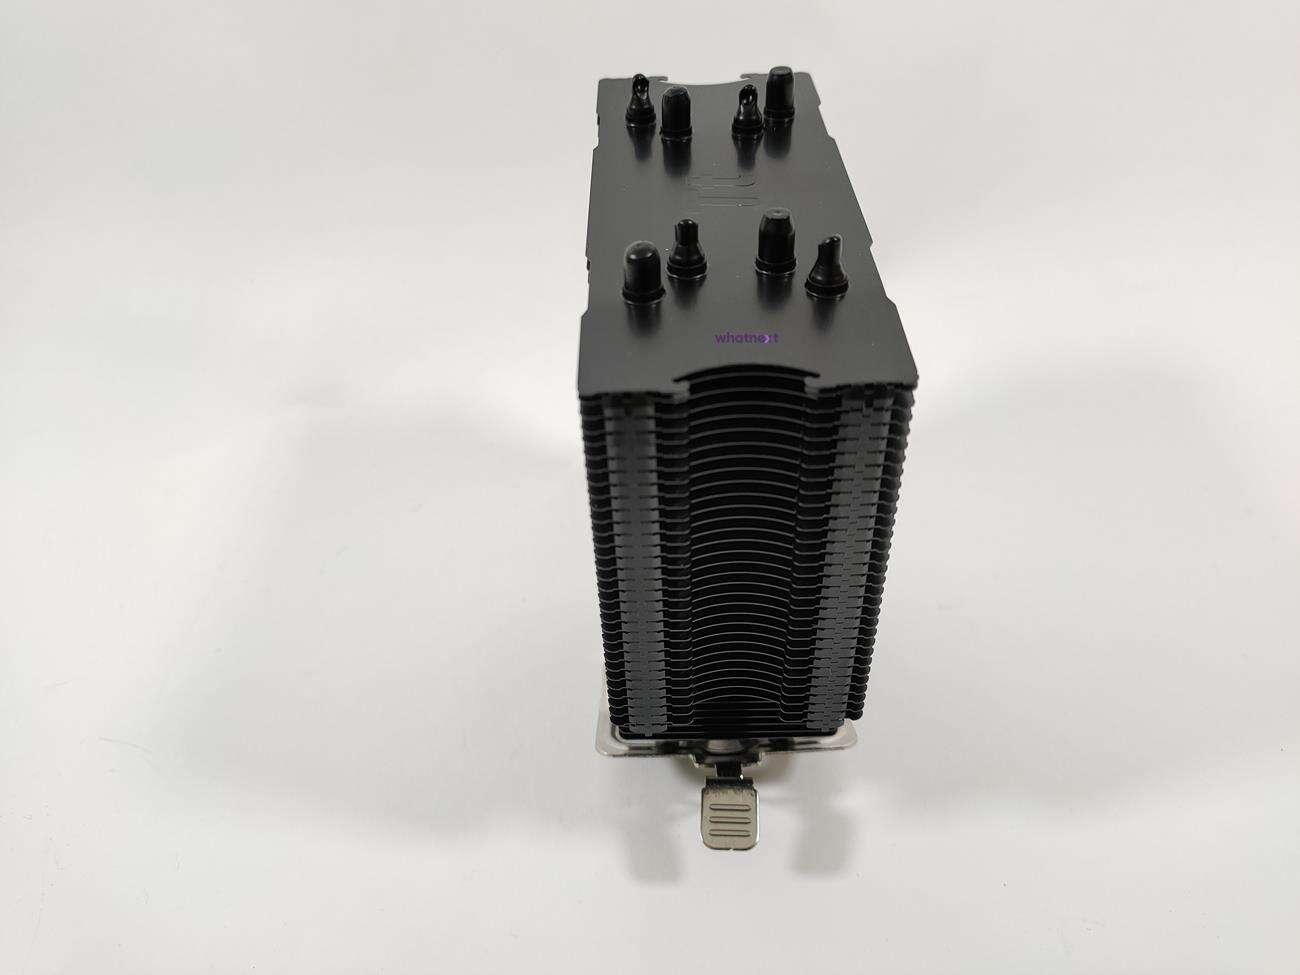 test Thermaltake UX200 ARGB, recenzja Thermaltake UX200 ARGB, review Thermaltake UX200 ARGB, opinia Thermaltake UX200 ARGB, cena Thermaltake UX200 ARGB